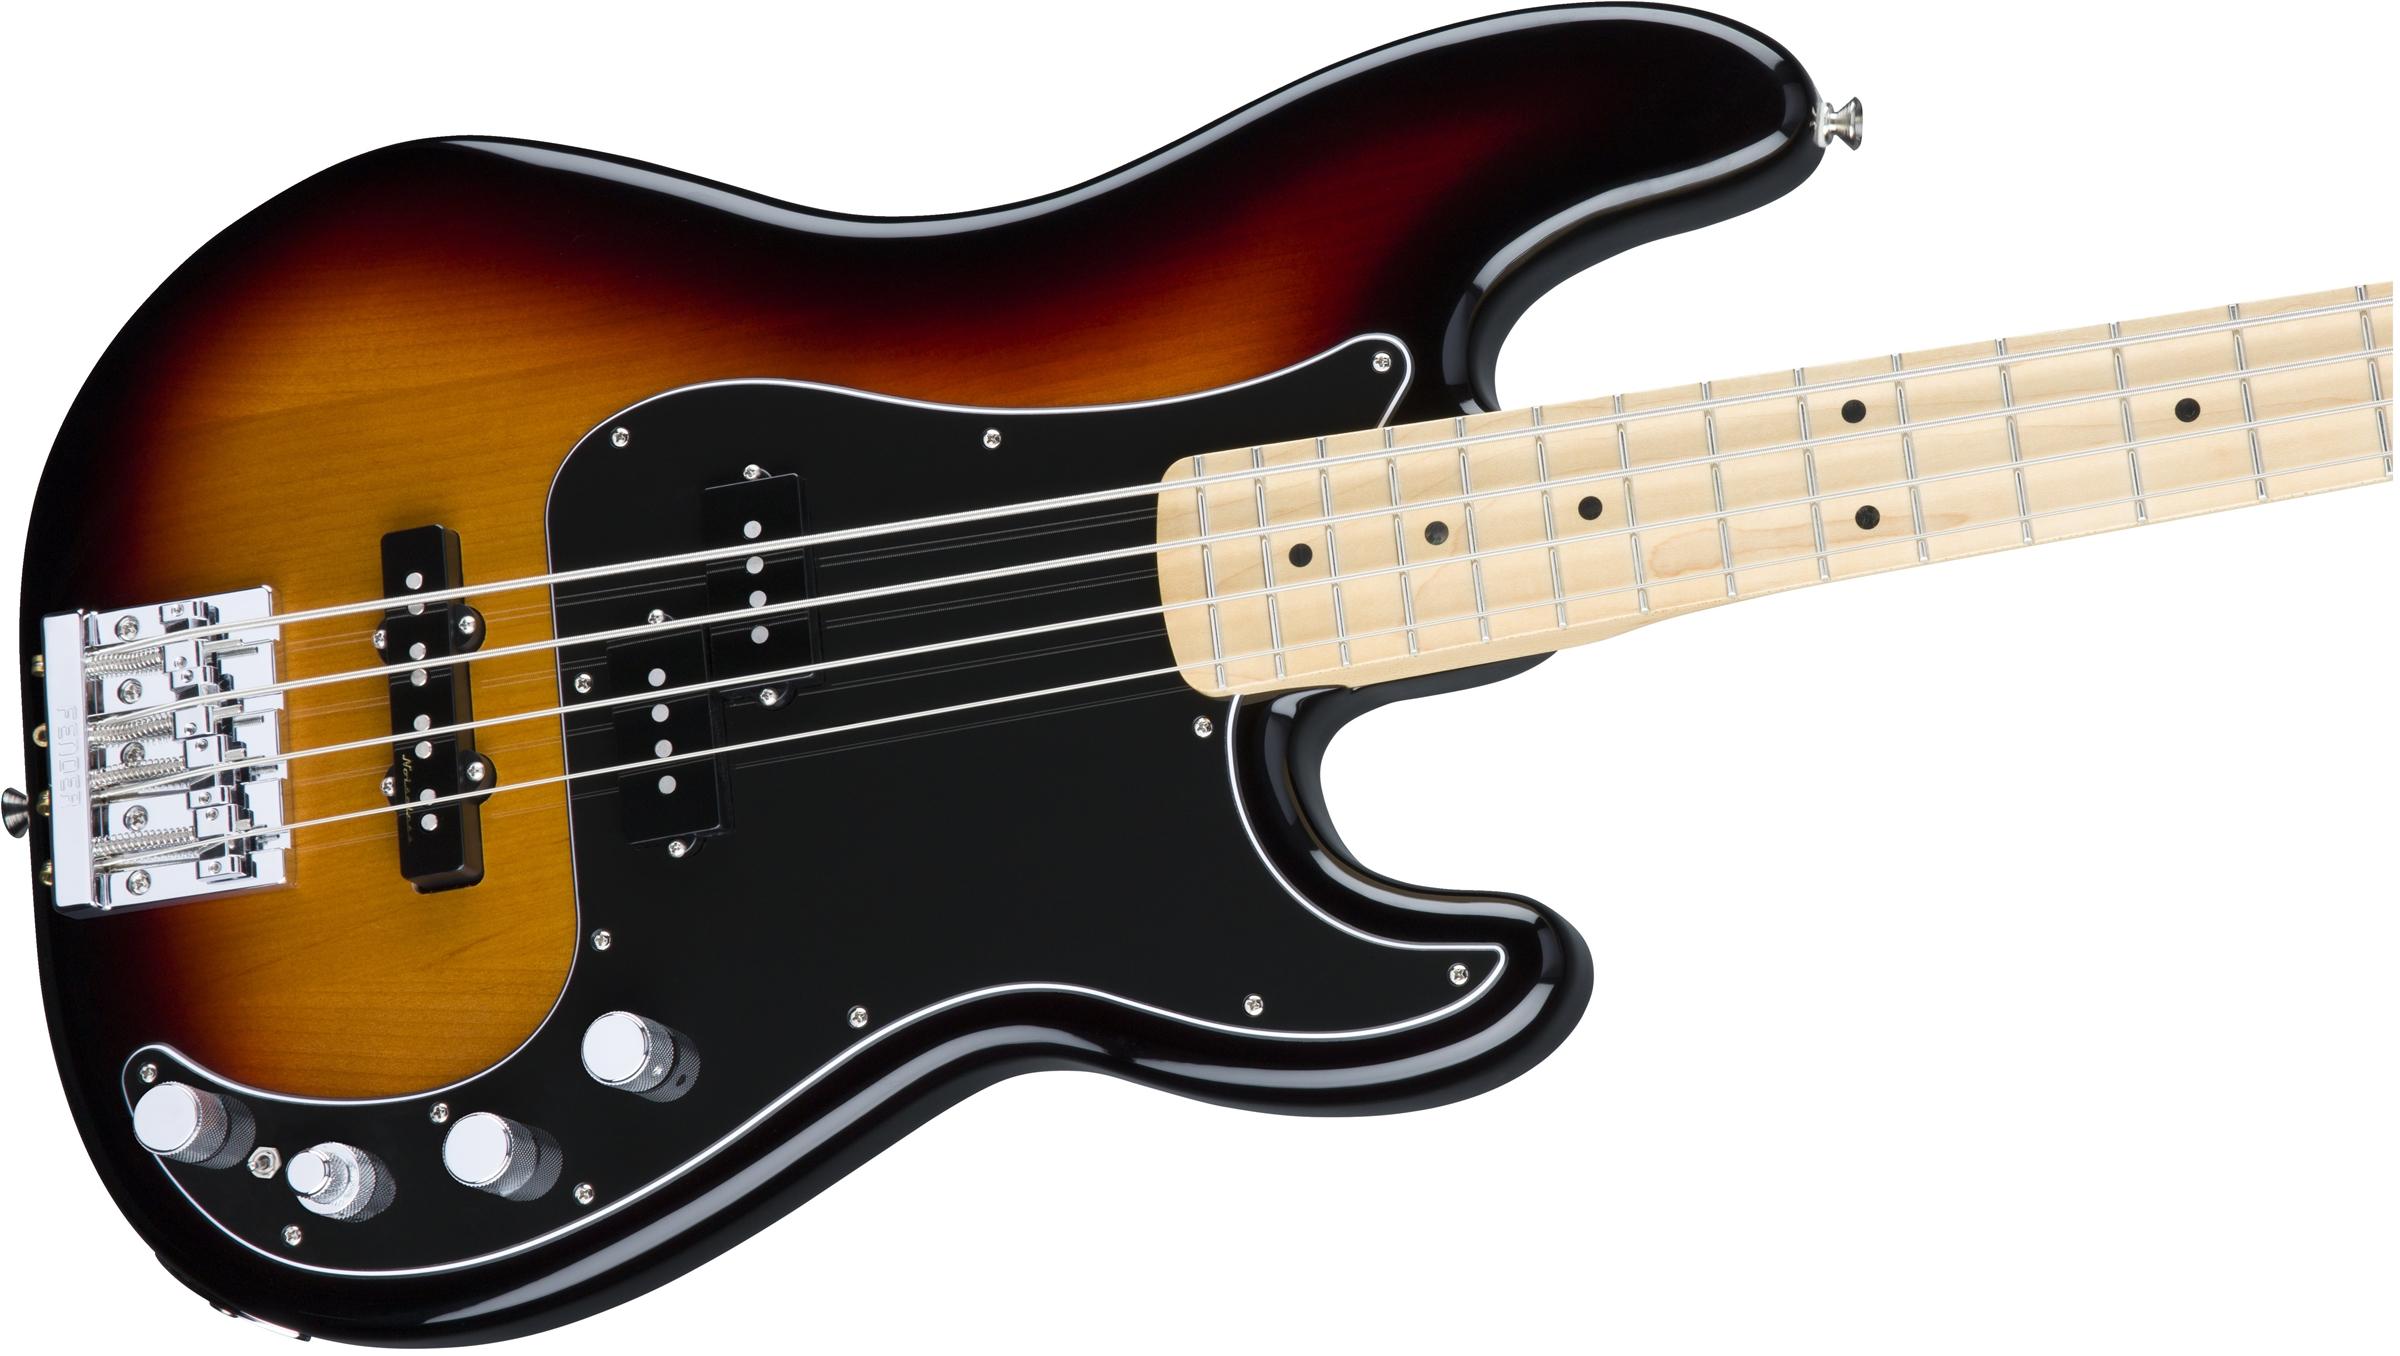 Fender deluxe active p bass special maple fingerboard